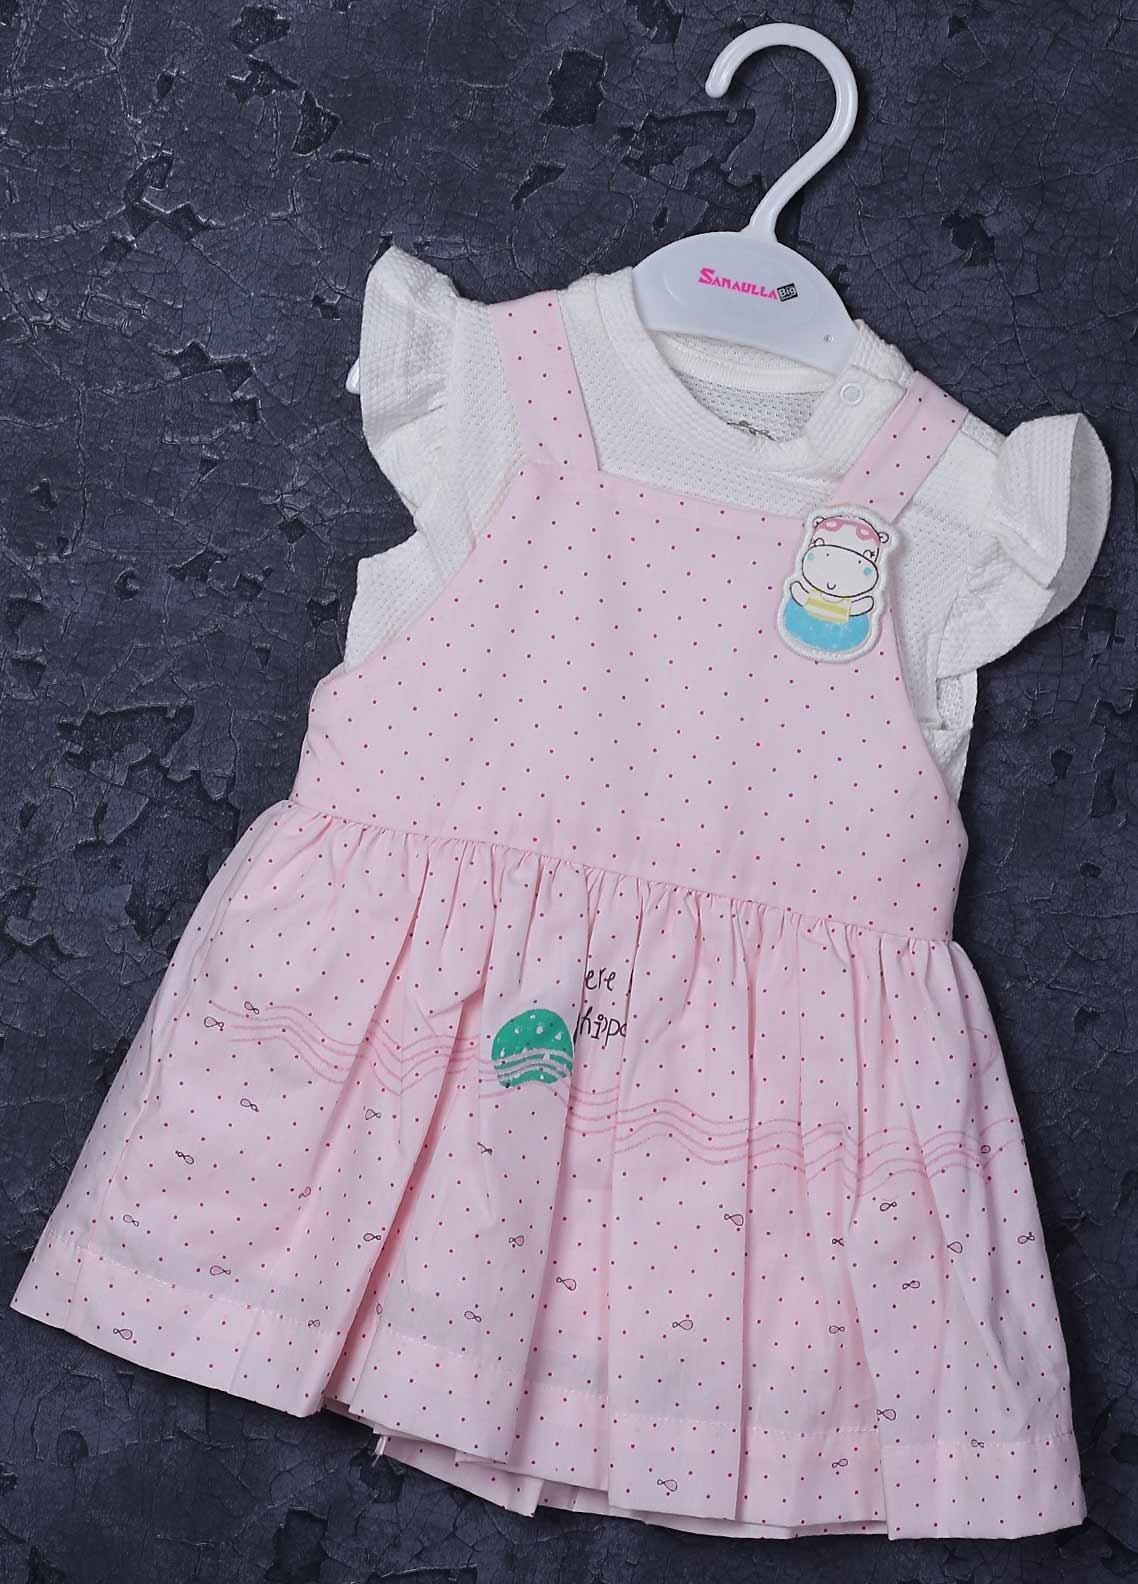 Sanaulla Exclusive Range Cotton Fancy Frocks for Girls -  2545 Pink